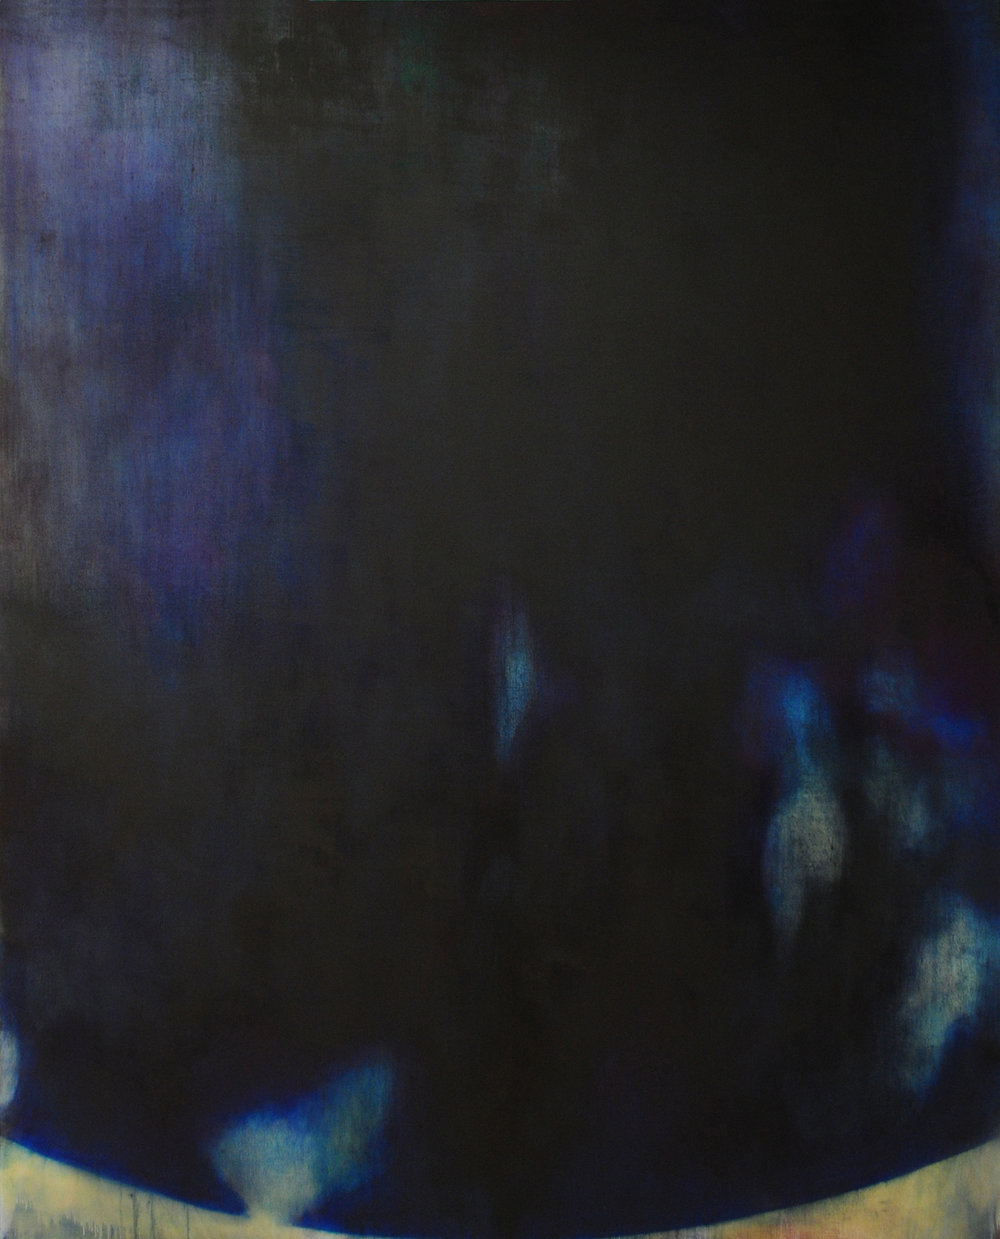 Kugelblitz,   2005-2011 ,  Oil, acrylic on canva s , 75 x 60 inches.